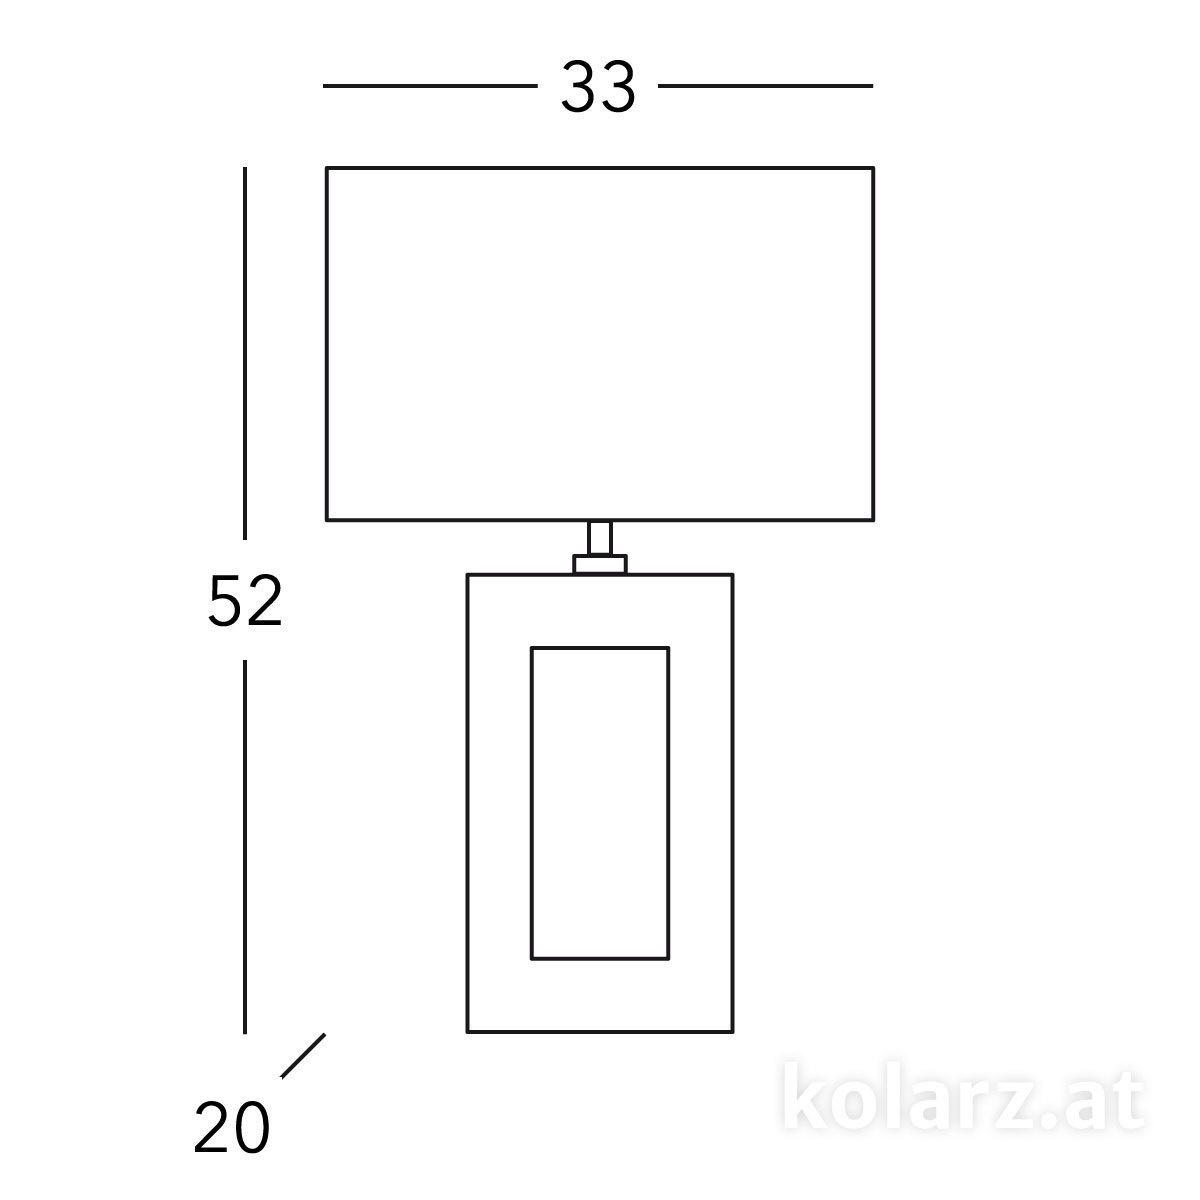 5360-70180__al99-s1.jpg